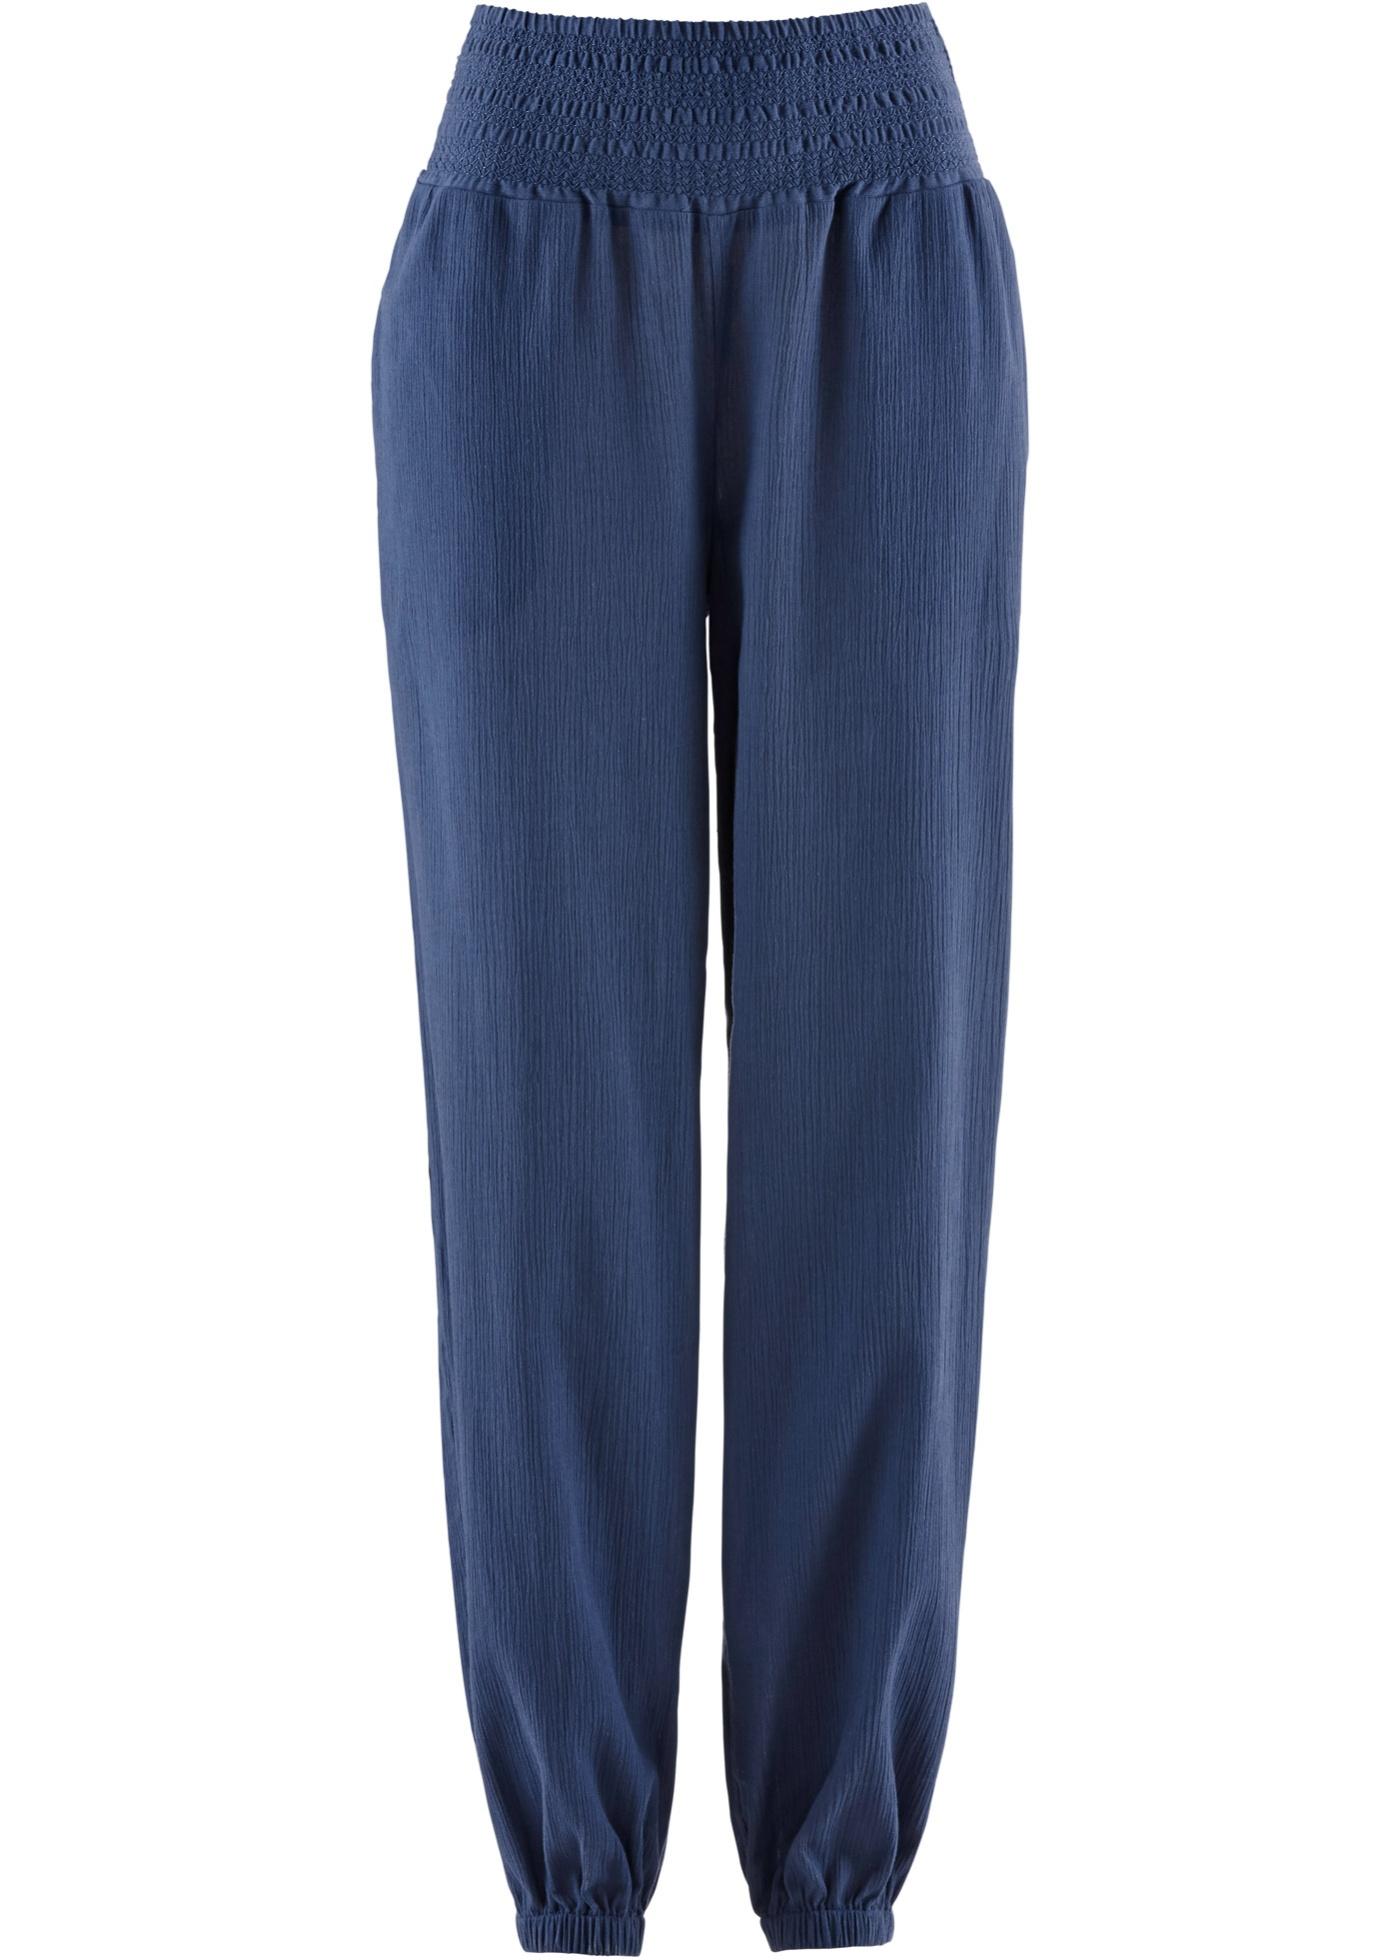 Pantalon sarouel froissé bleu femme - bonprix